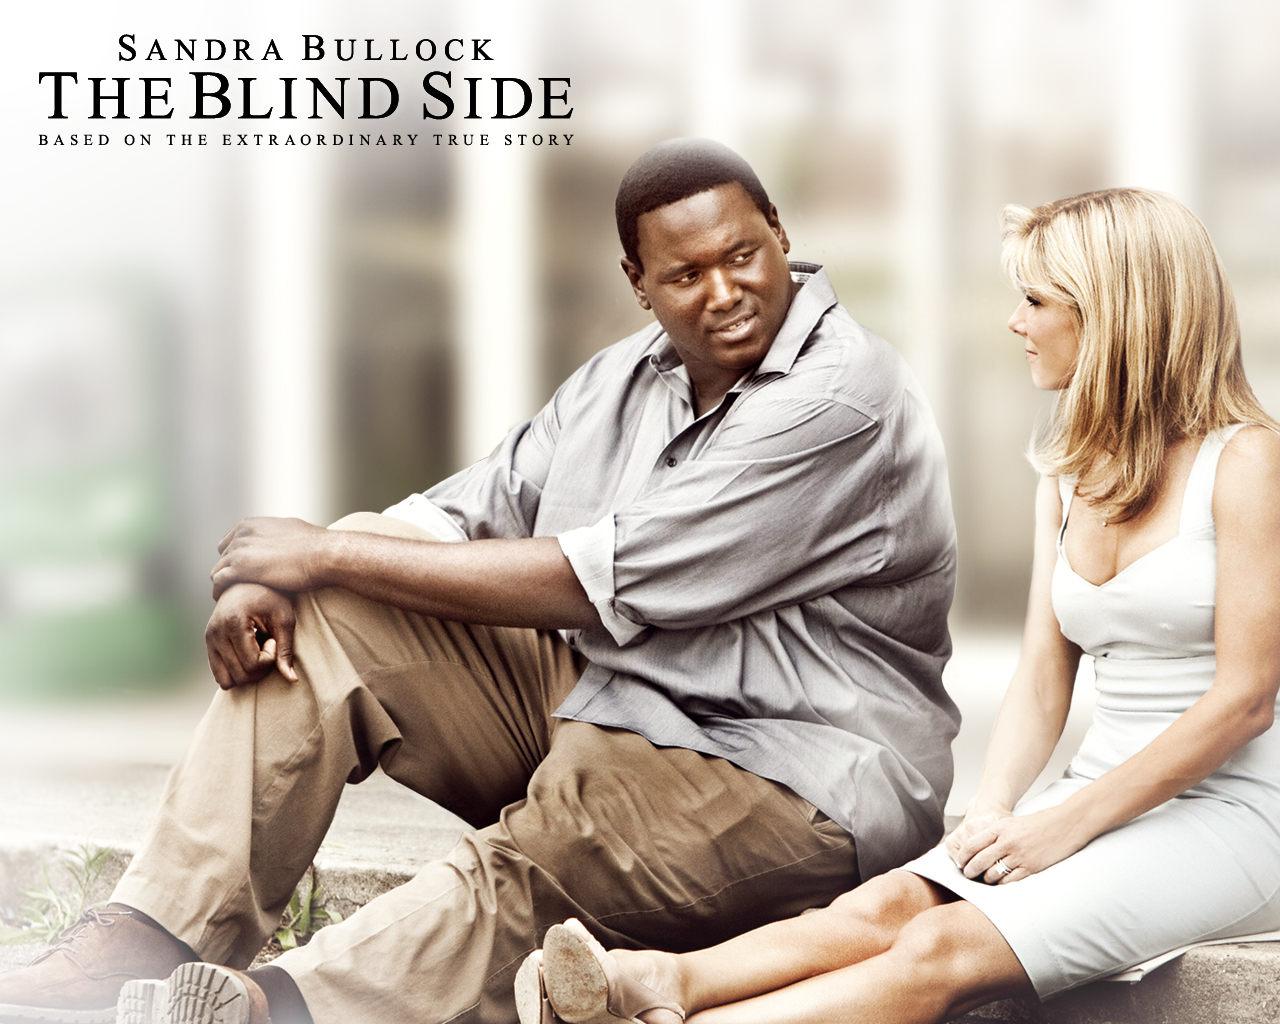 http://1.bp.blogspot.com/-uUger5ILx2k/Tcf3TC5Y9WI/AAAAAAAAAEU/z5hqFkgUqPQ/s1600/The-Blind-Side3.jpg